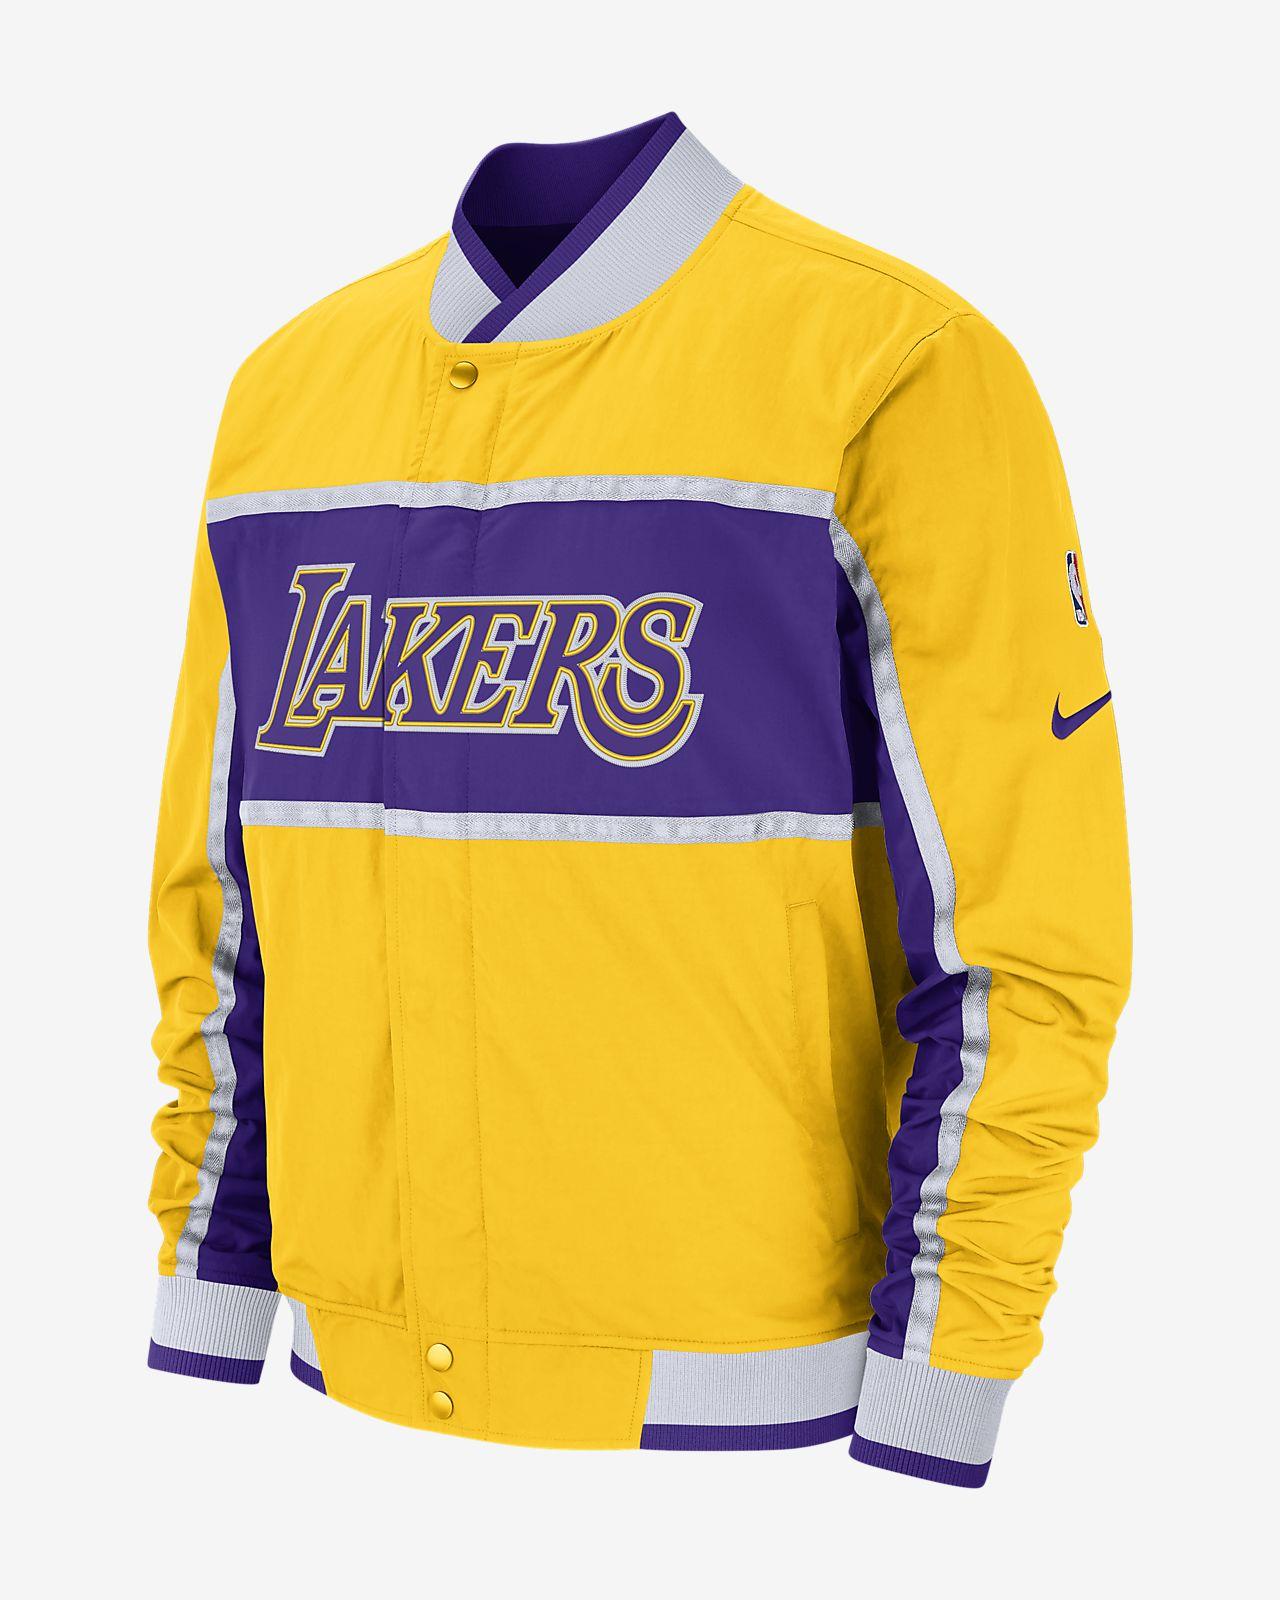 Los Angeles Lakers Nike Courtside Men's NBA Jacket